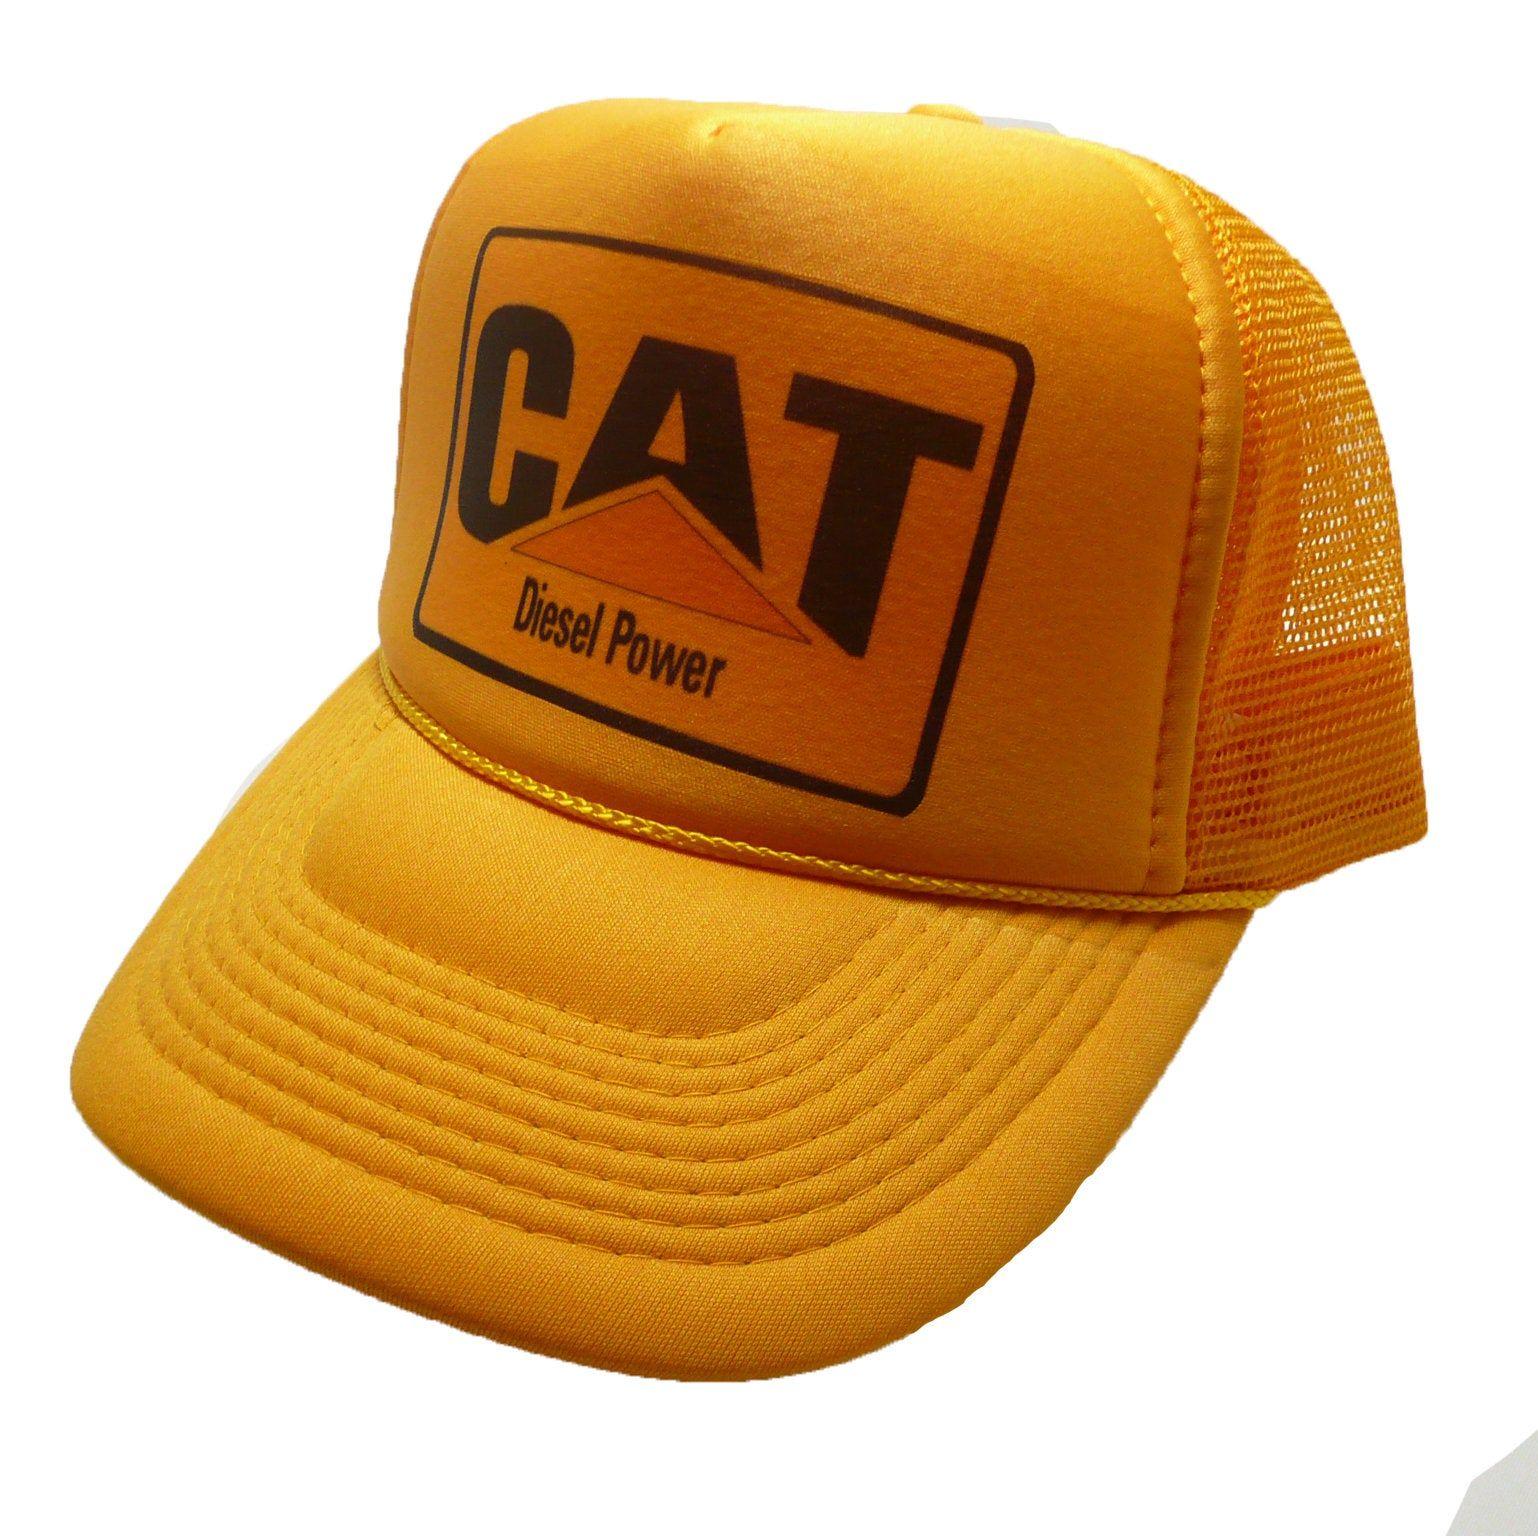 Vintage CAT tractors hat trucker hat Diesel Power hat new